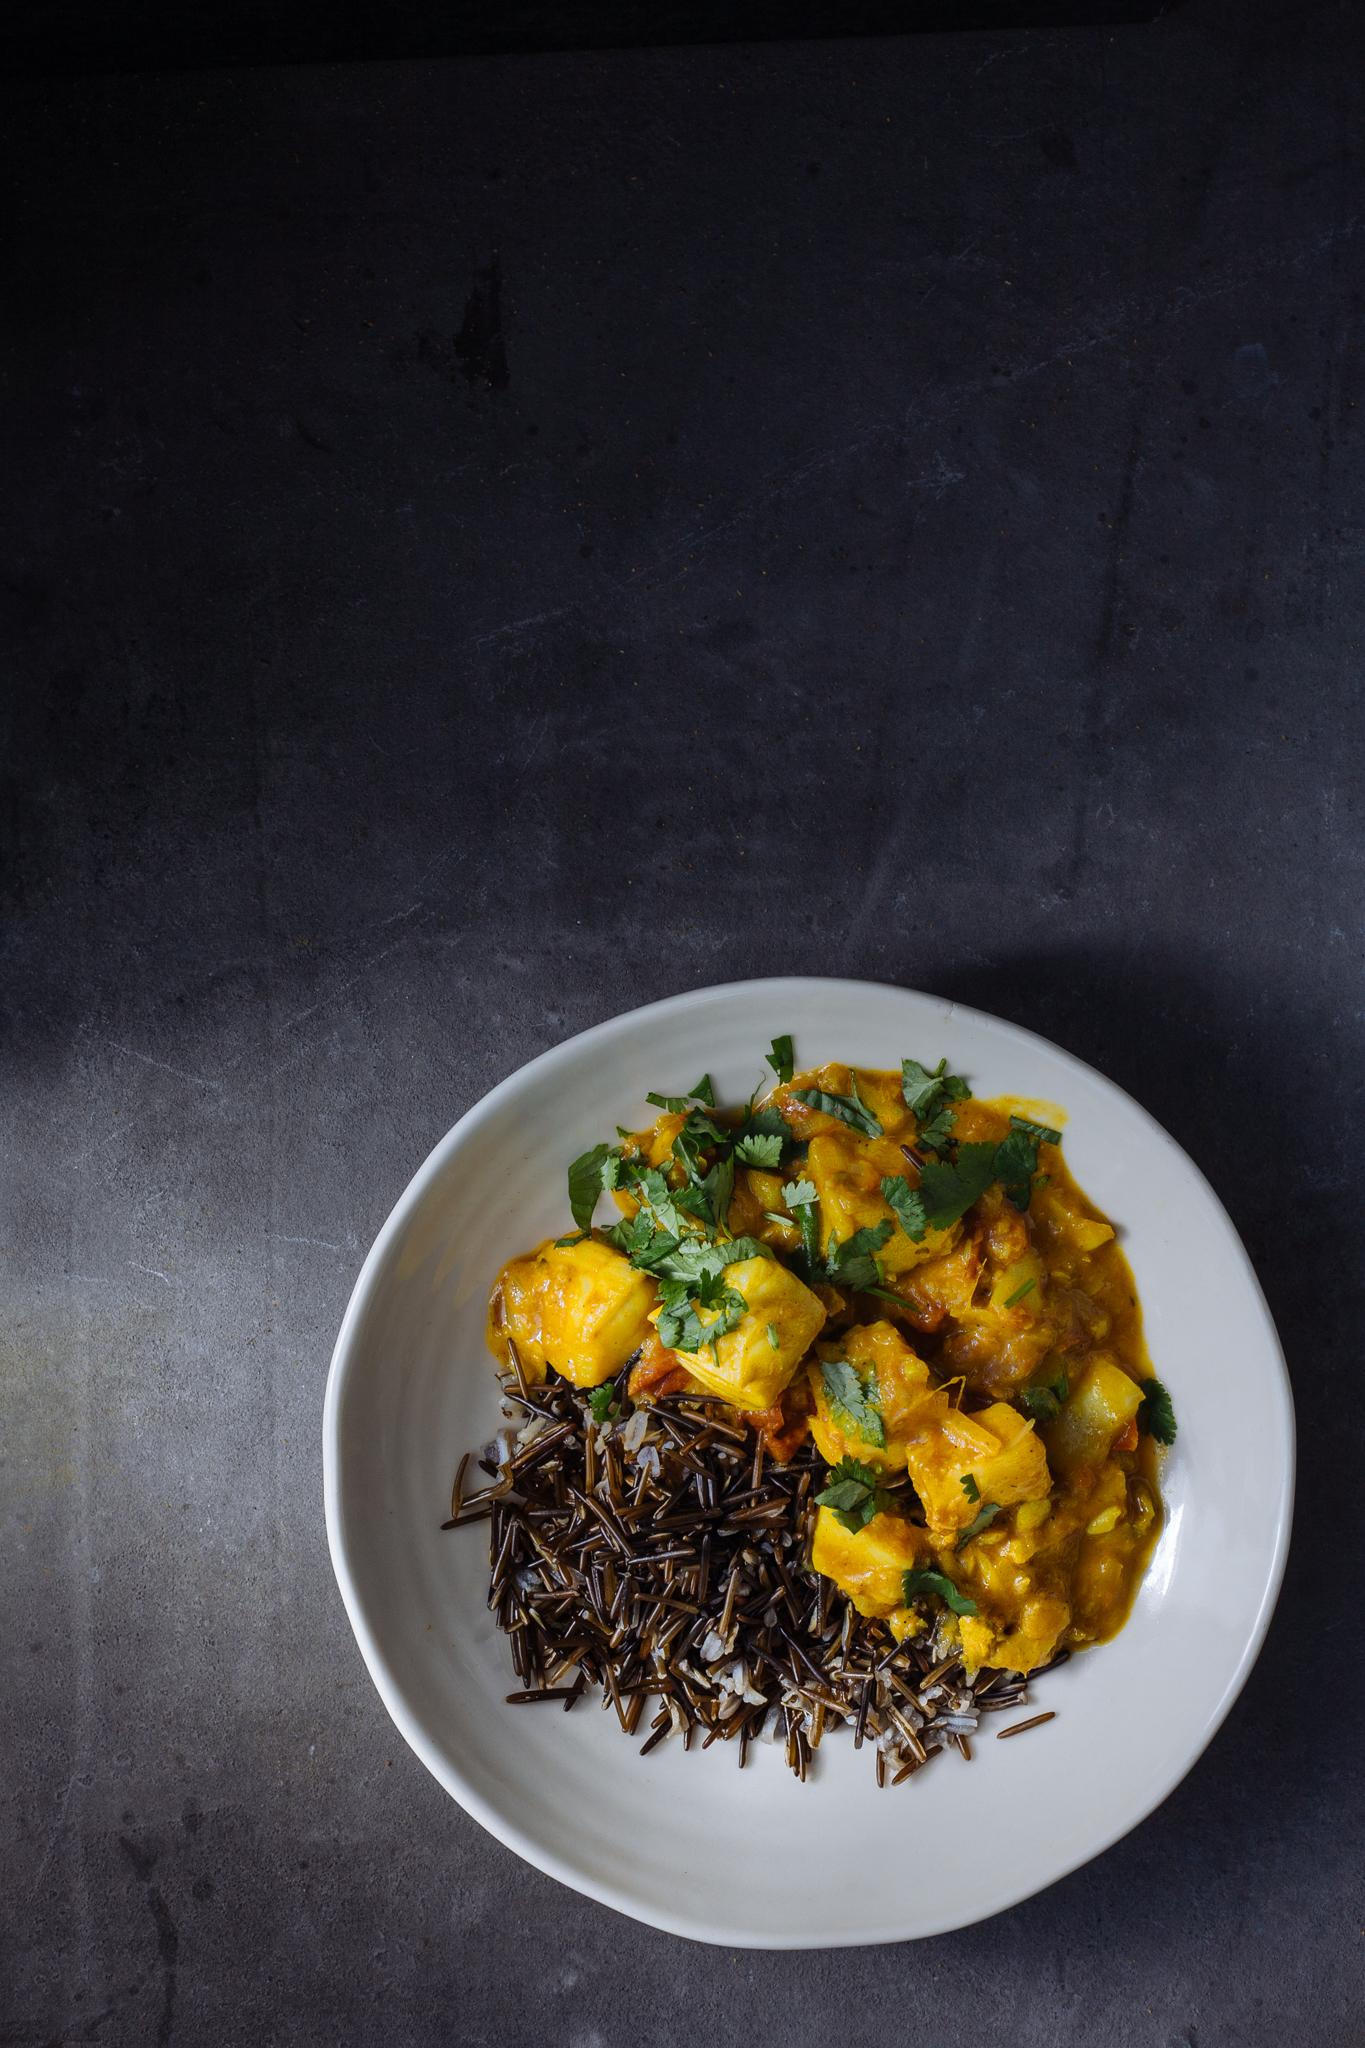 Caril de peixe com arroz selvagem